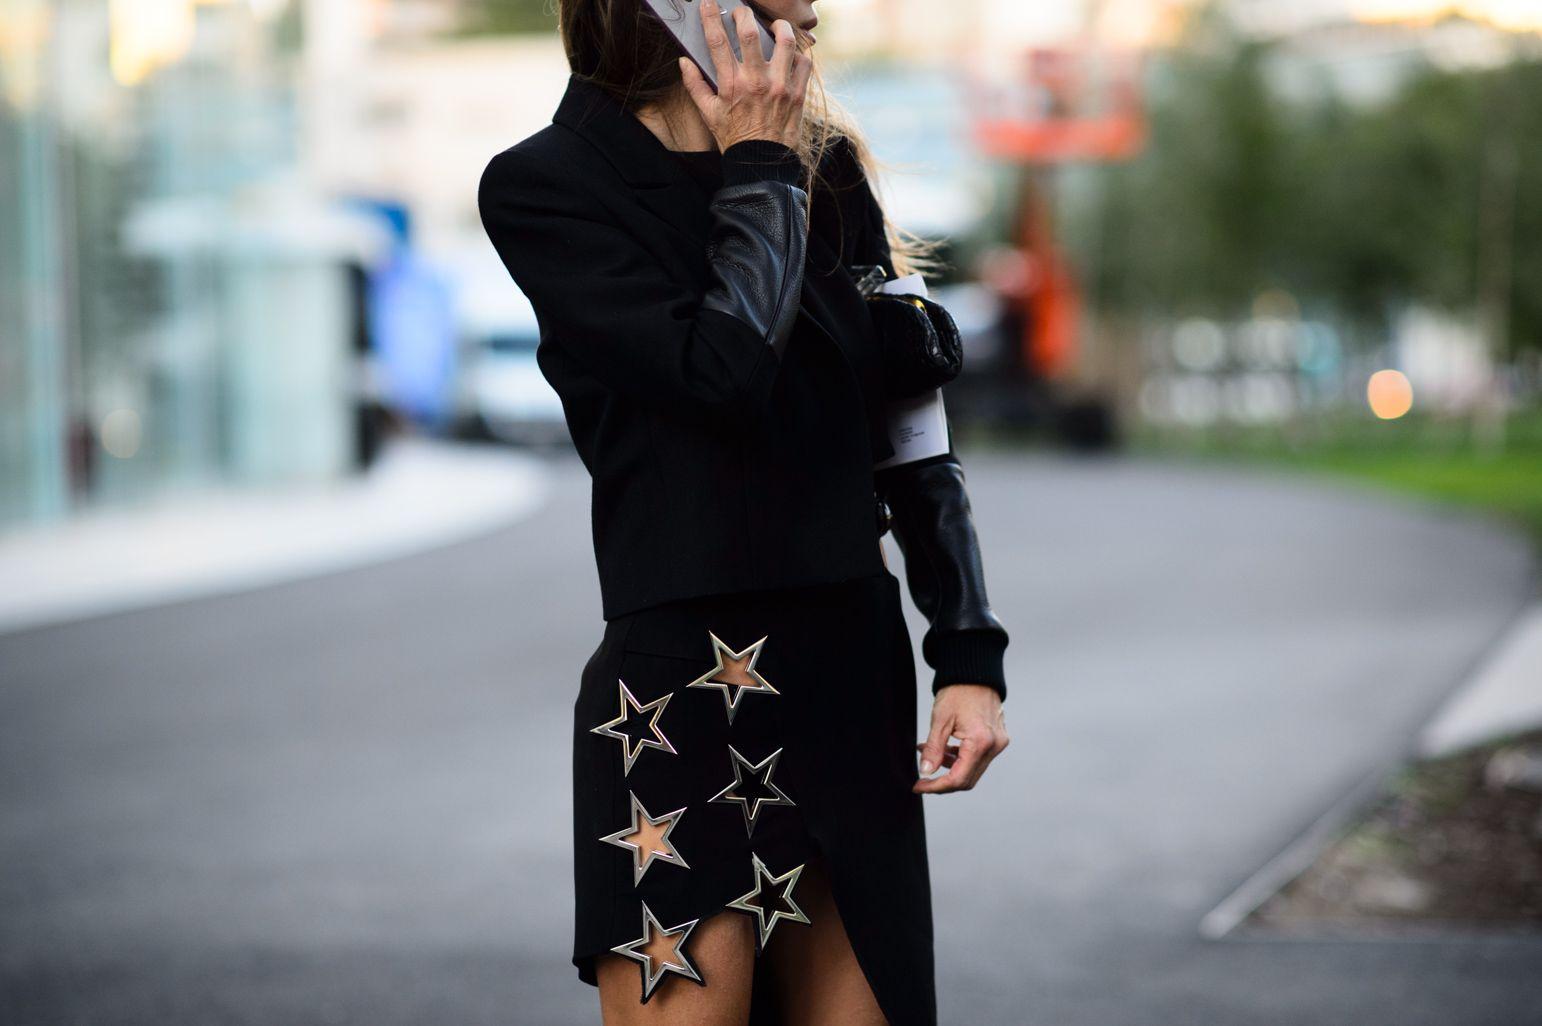 paris fashion week spring 2016 day 1 gorgeous style pinterest mode printemps t mode et. Black Bedroom Furniture Sets. Home Design Ideas